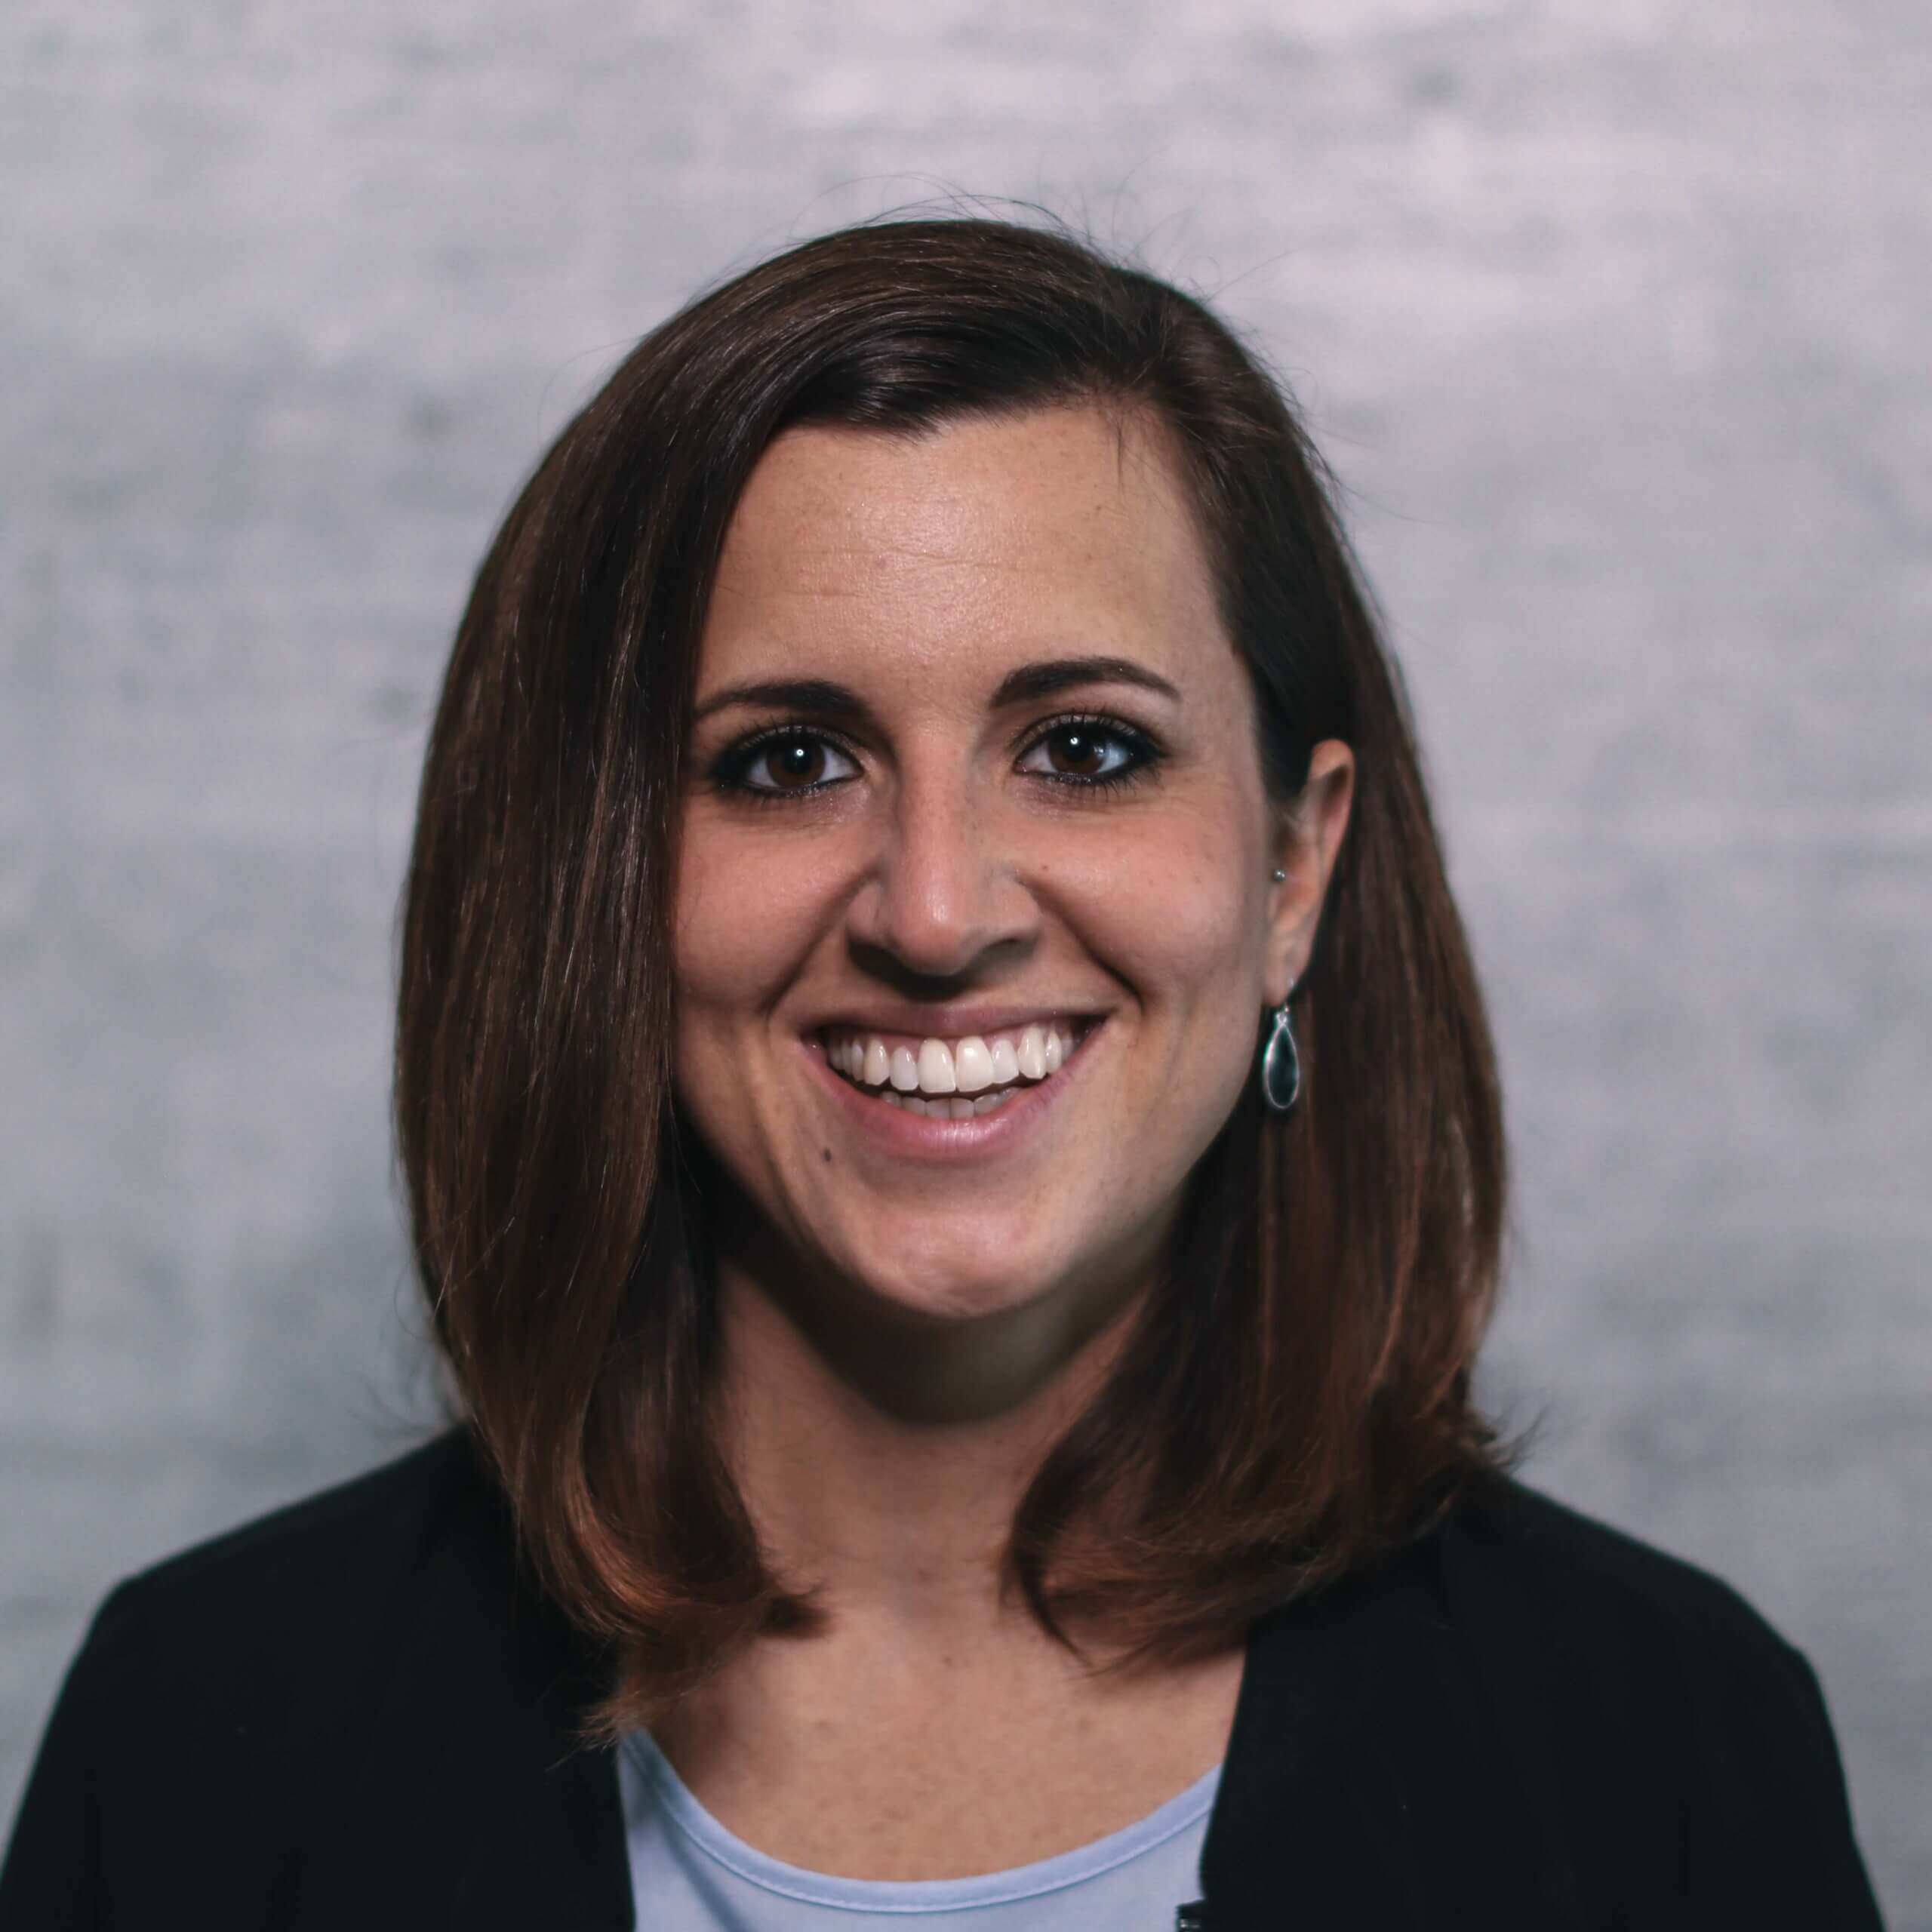 Melanie Troxler